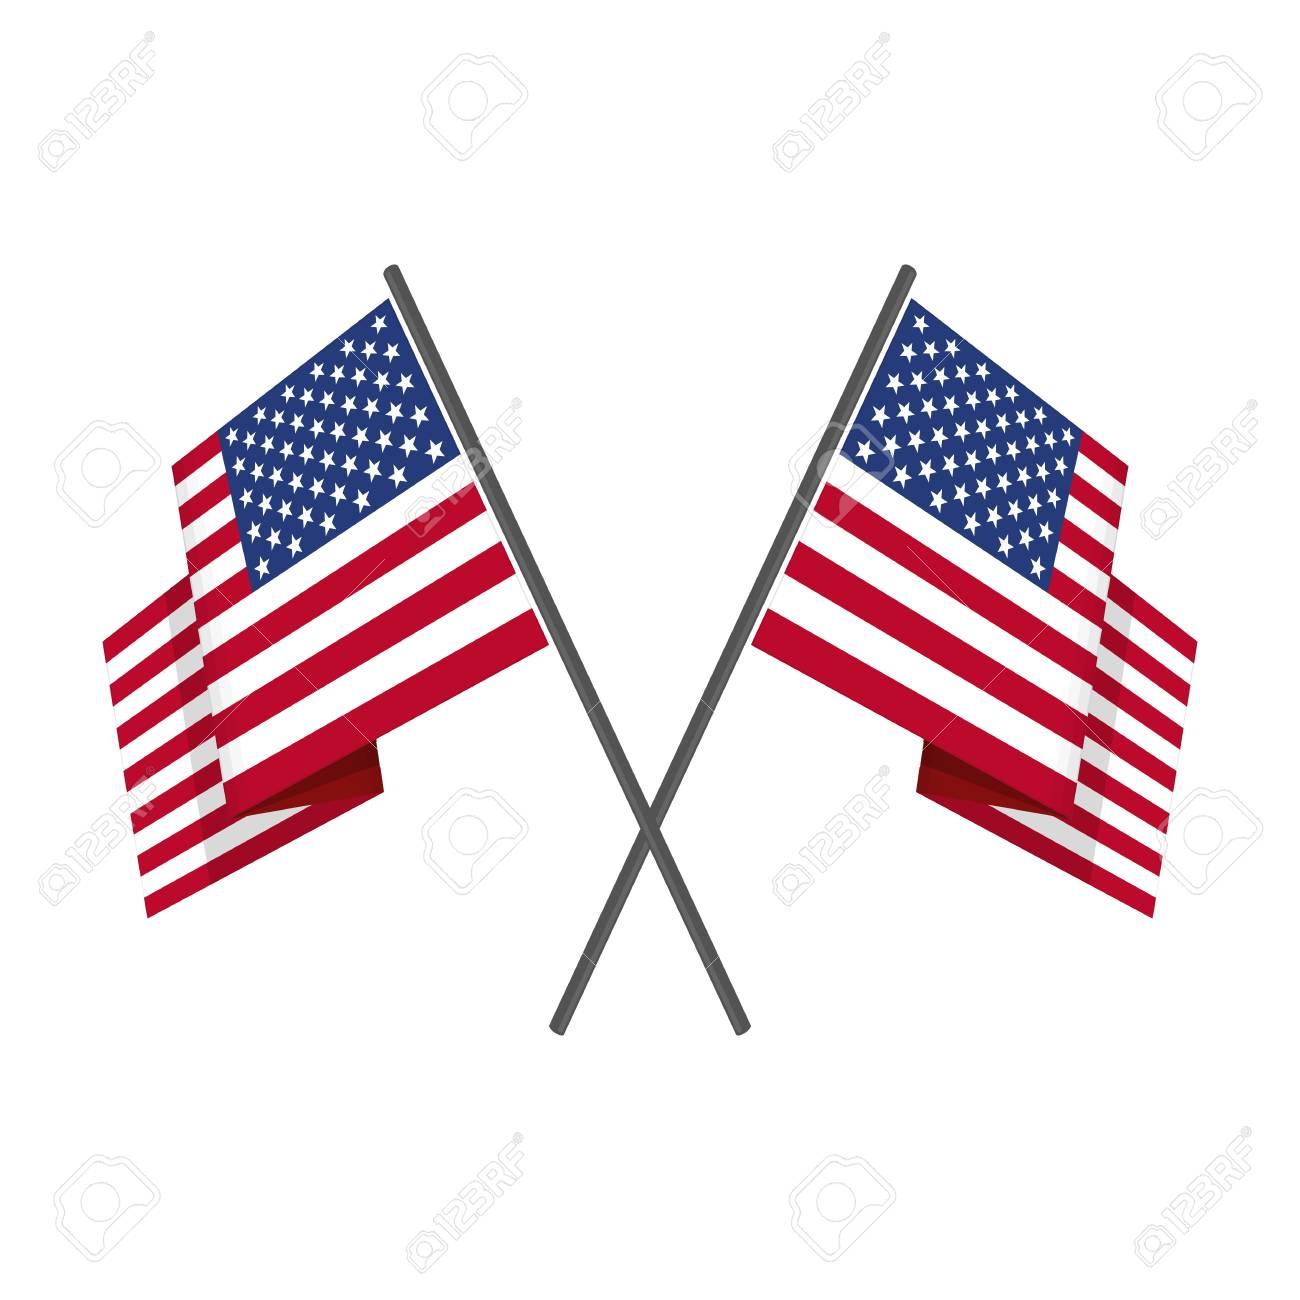 two crossed american flag vector royalty free cliparts vectors rh 123rf com american flag vector art american flag vector file